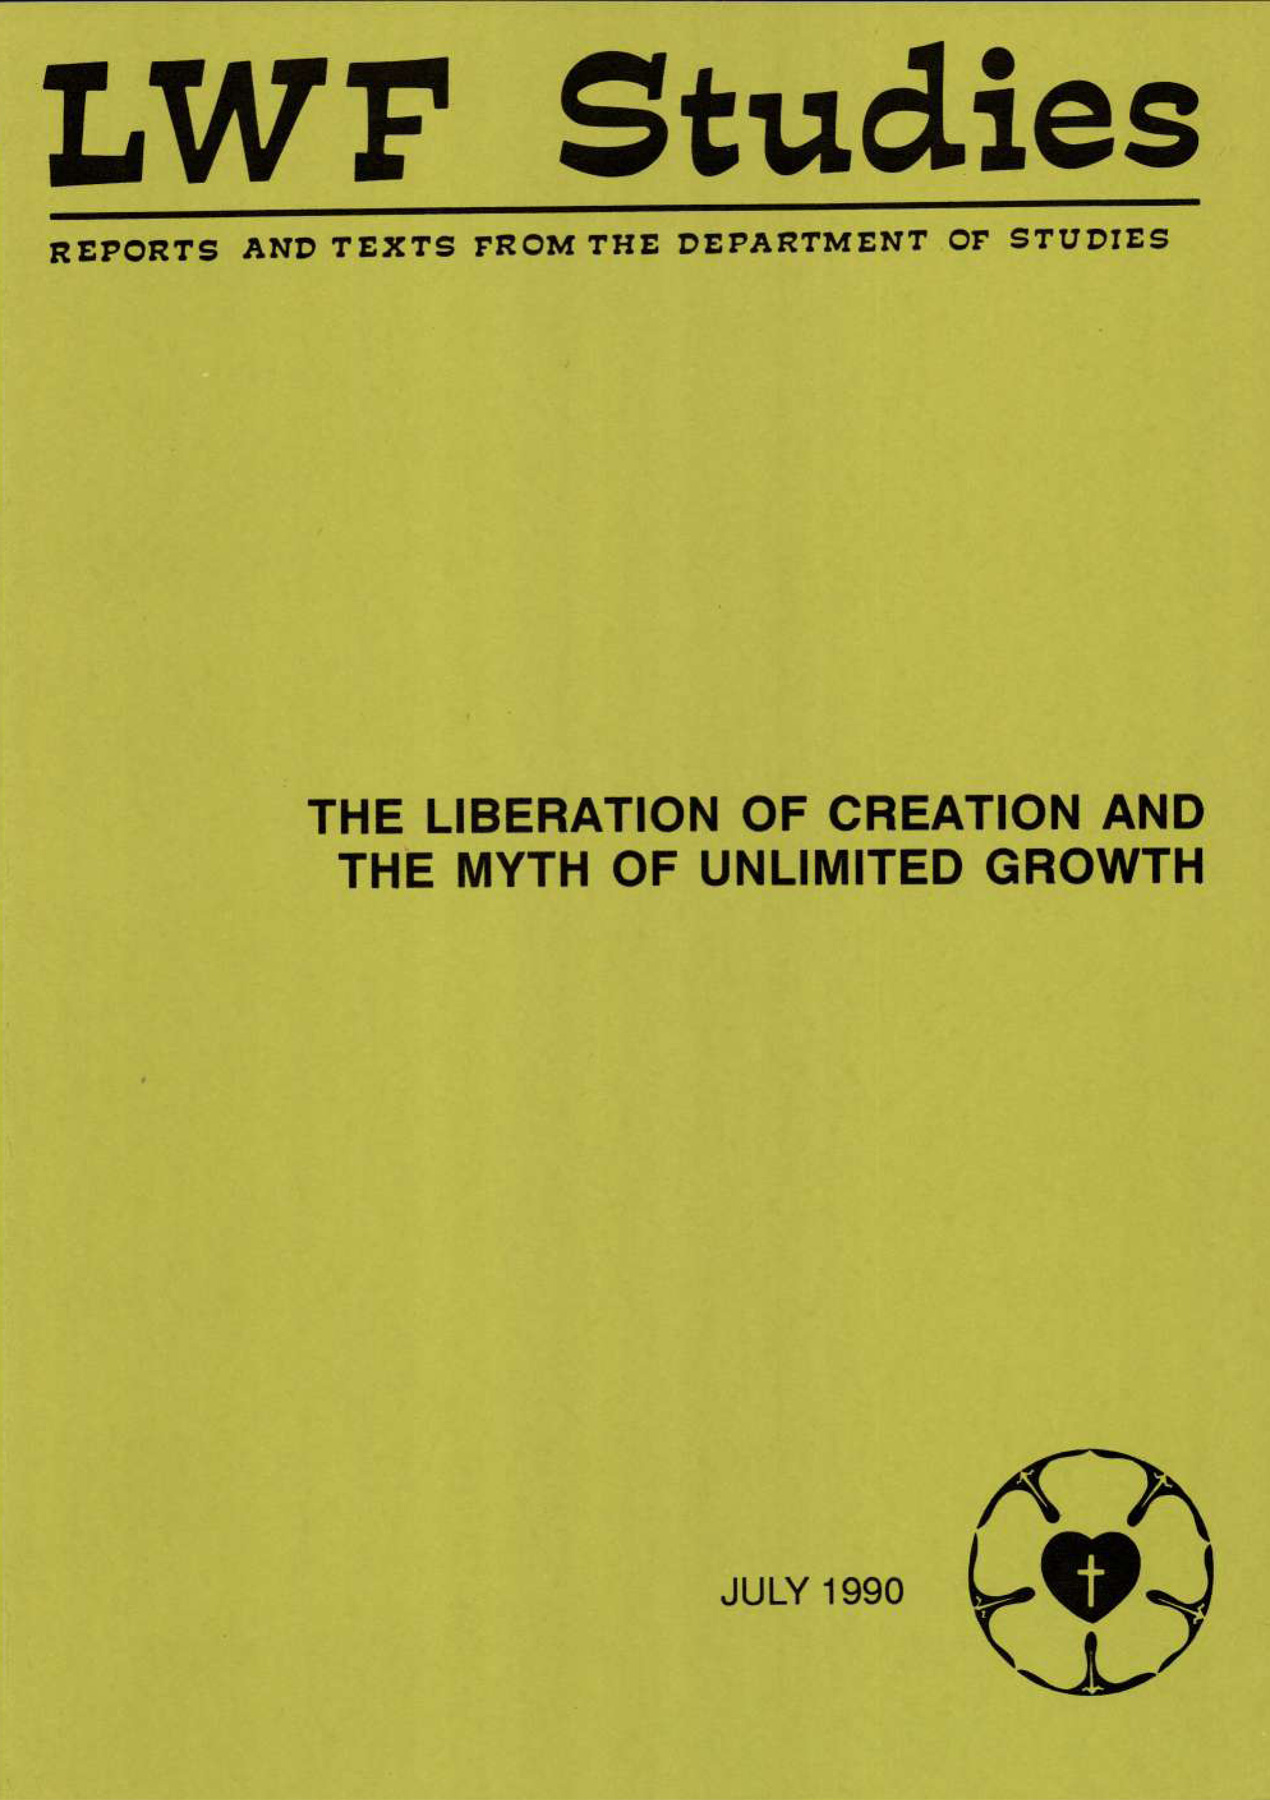 LWF Studies. July 1990